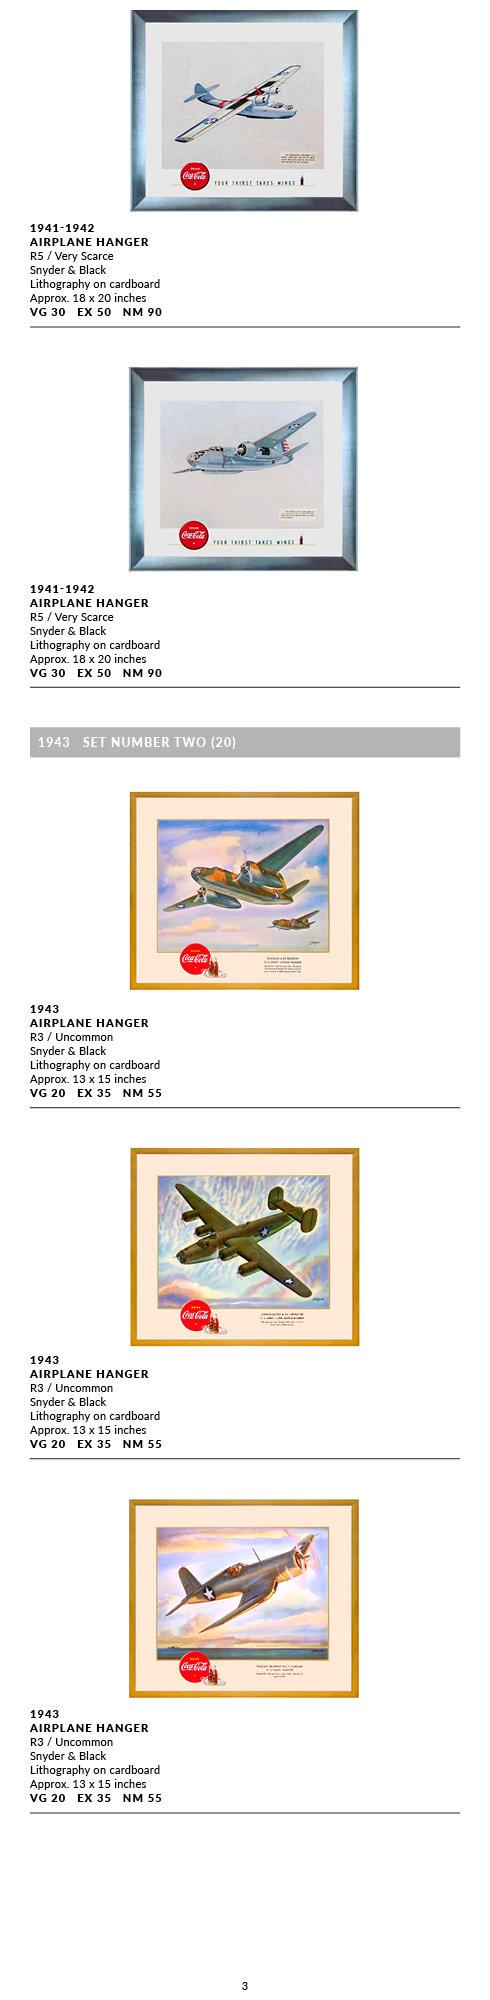 Aviation Cardboards_ DESKTOP_2020_3.jpg